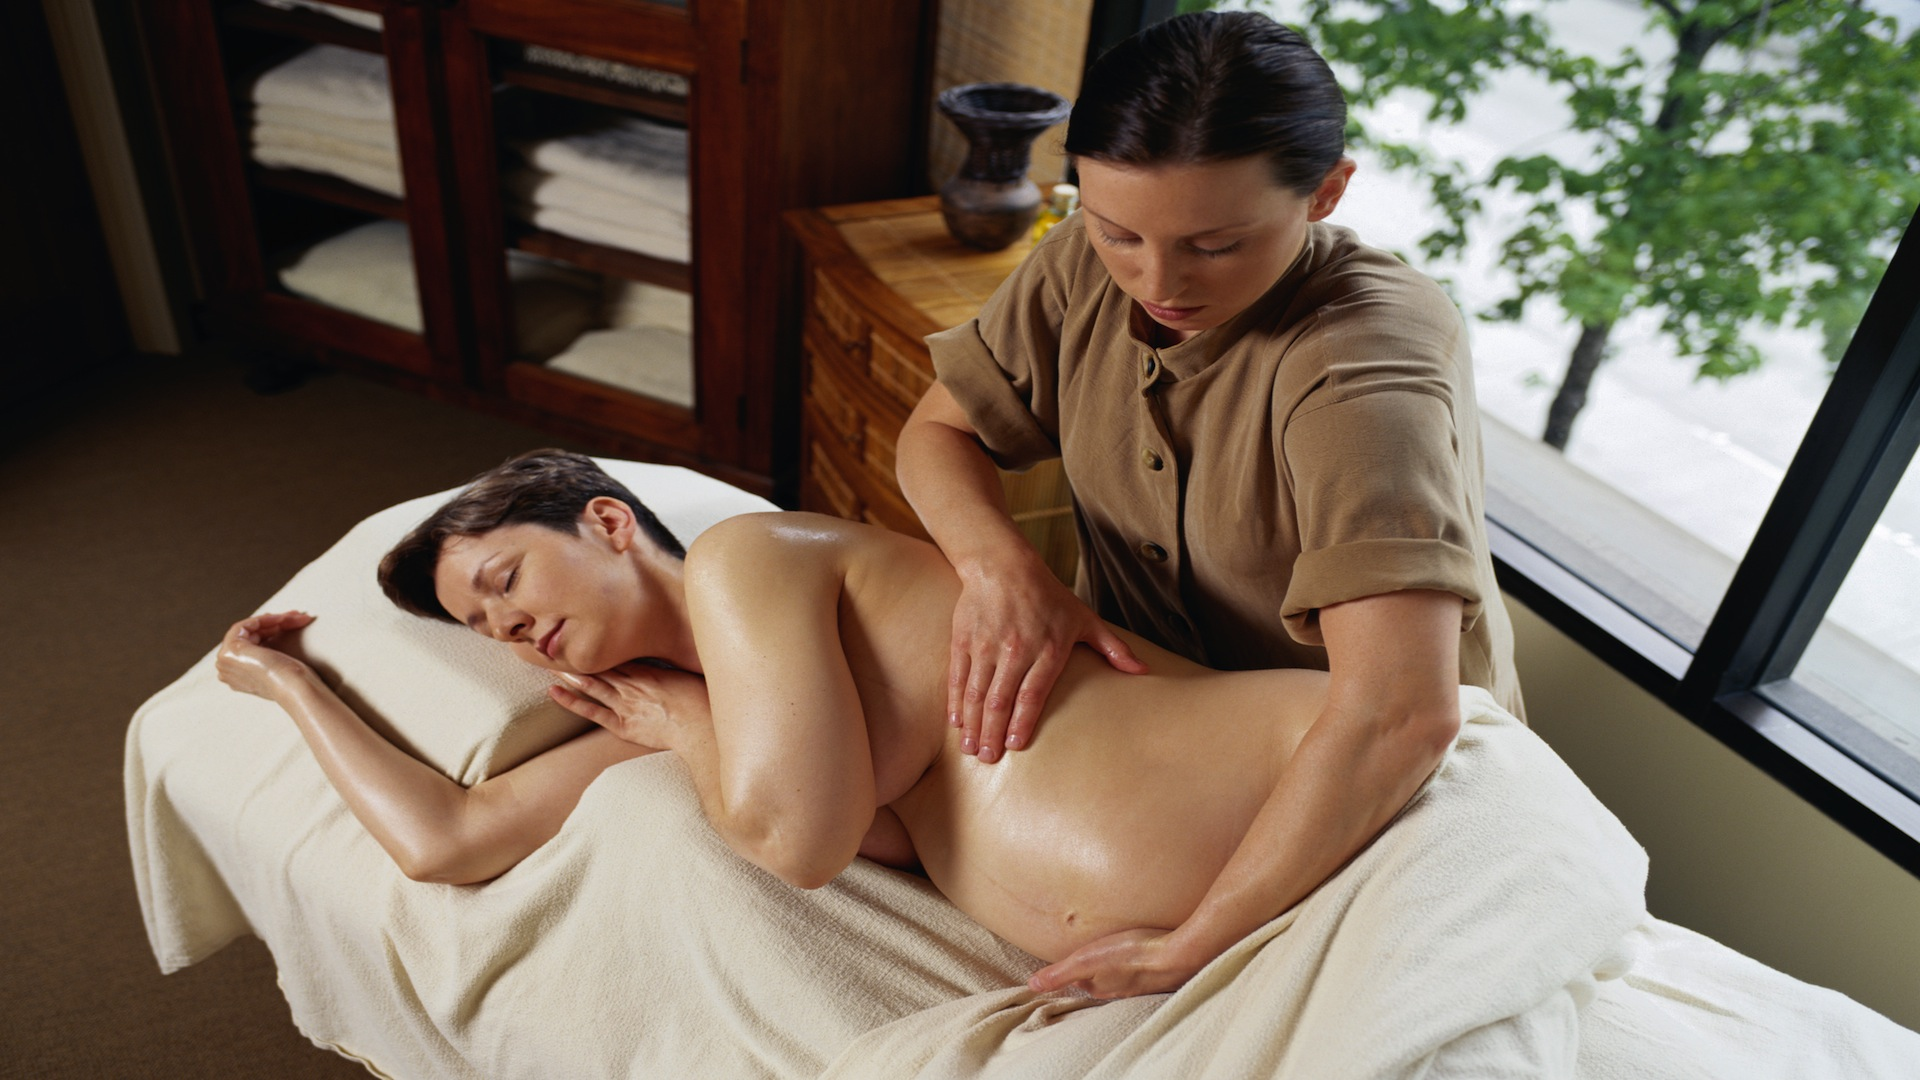 Getting A Massage While Pregnant  Hardcore Home Porn